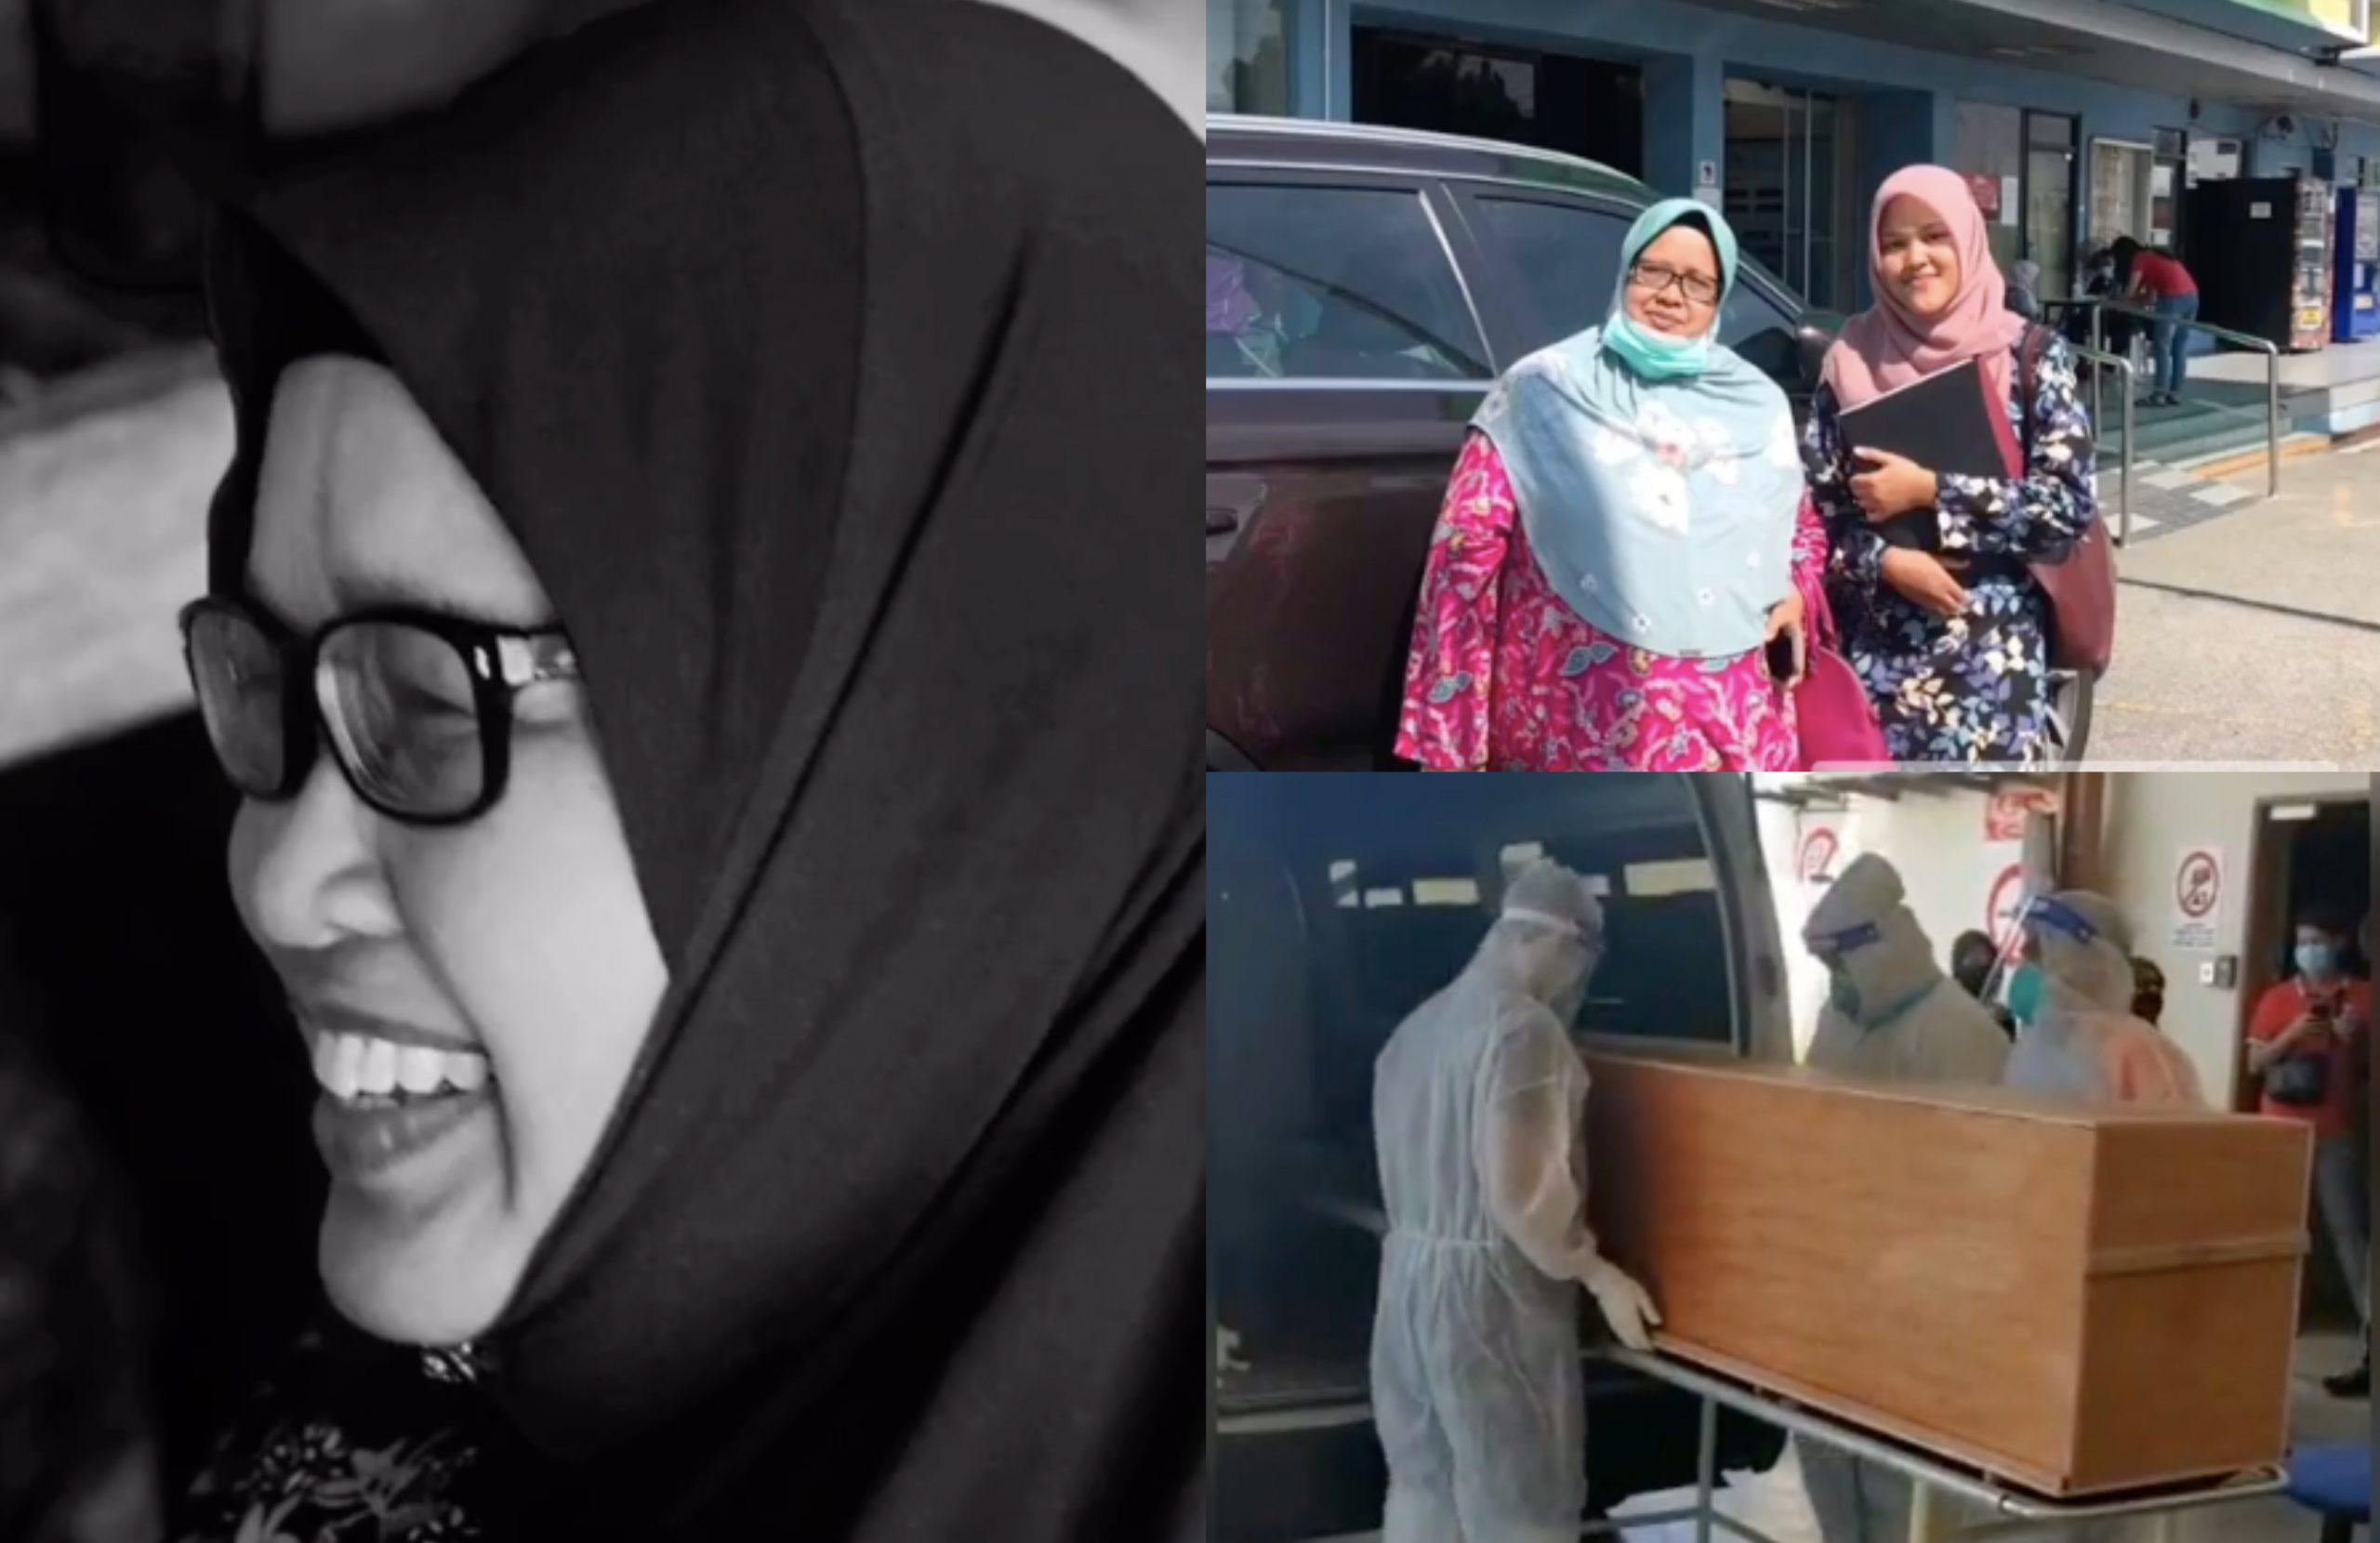 [VIDEO] 'Sempat' Luang Masa Bersama Arwah Ibu Selepas Balik Dari Kampus, Pelajar Sebak Ibu Meninggal Dunia Akibat Covid-19 1